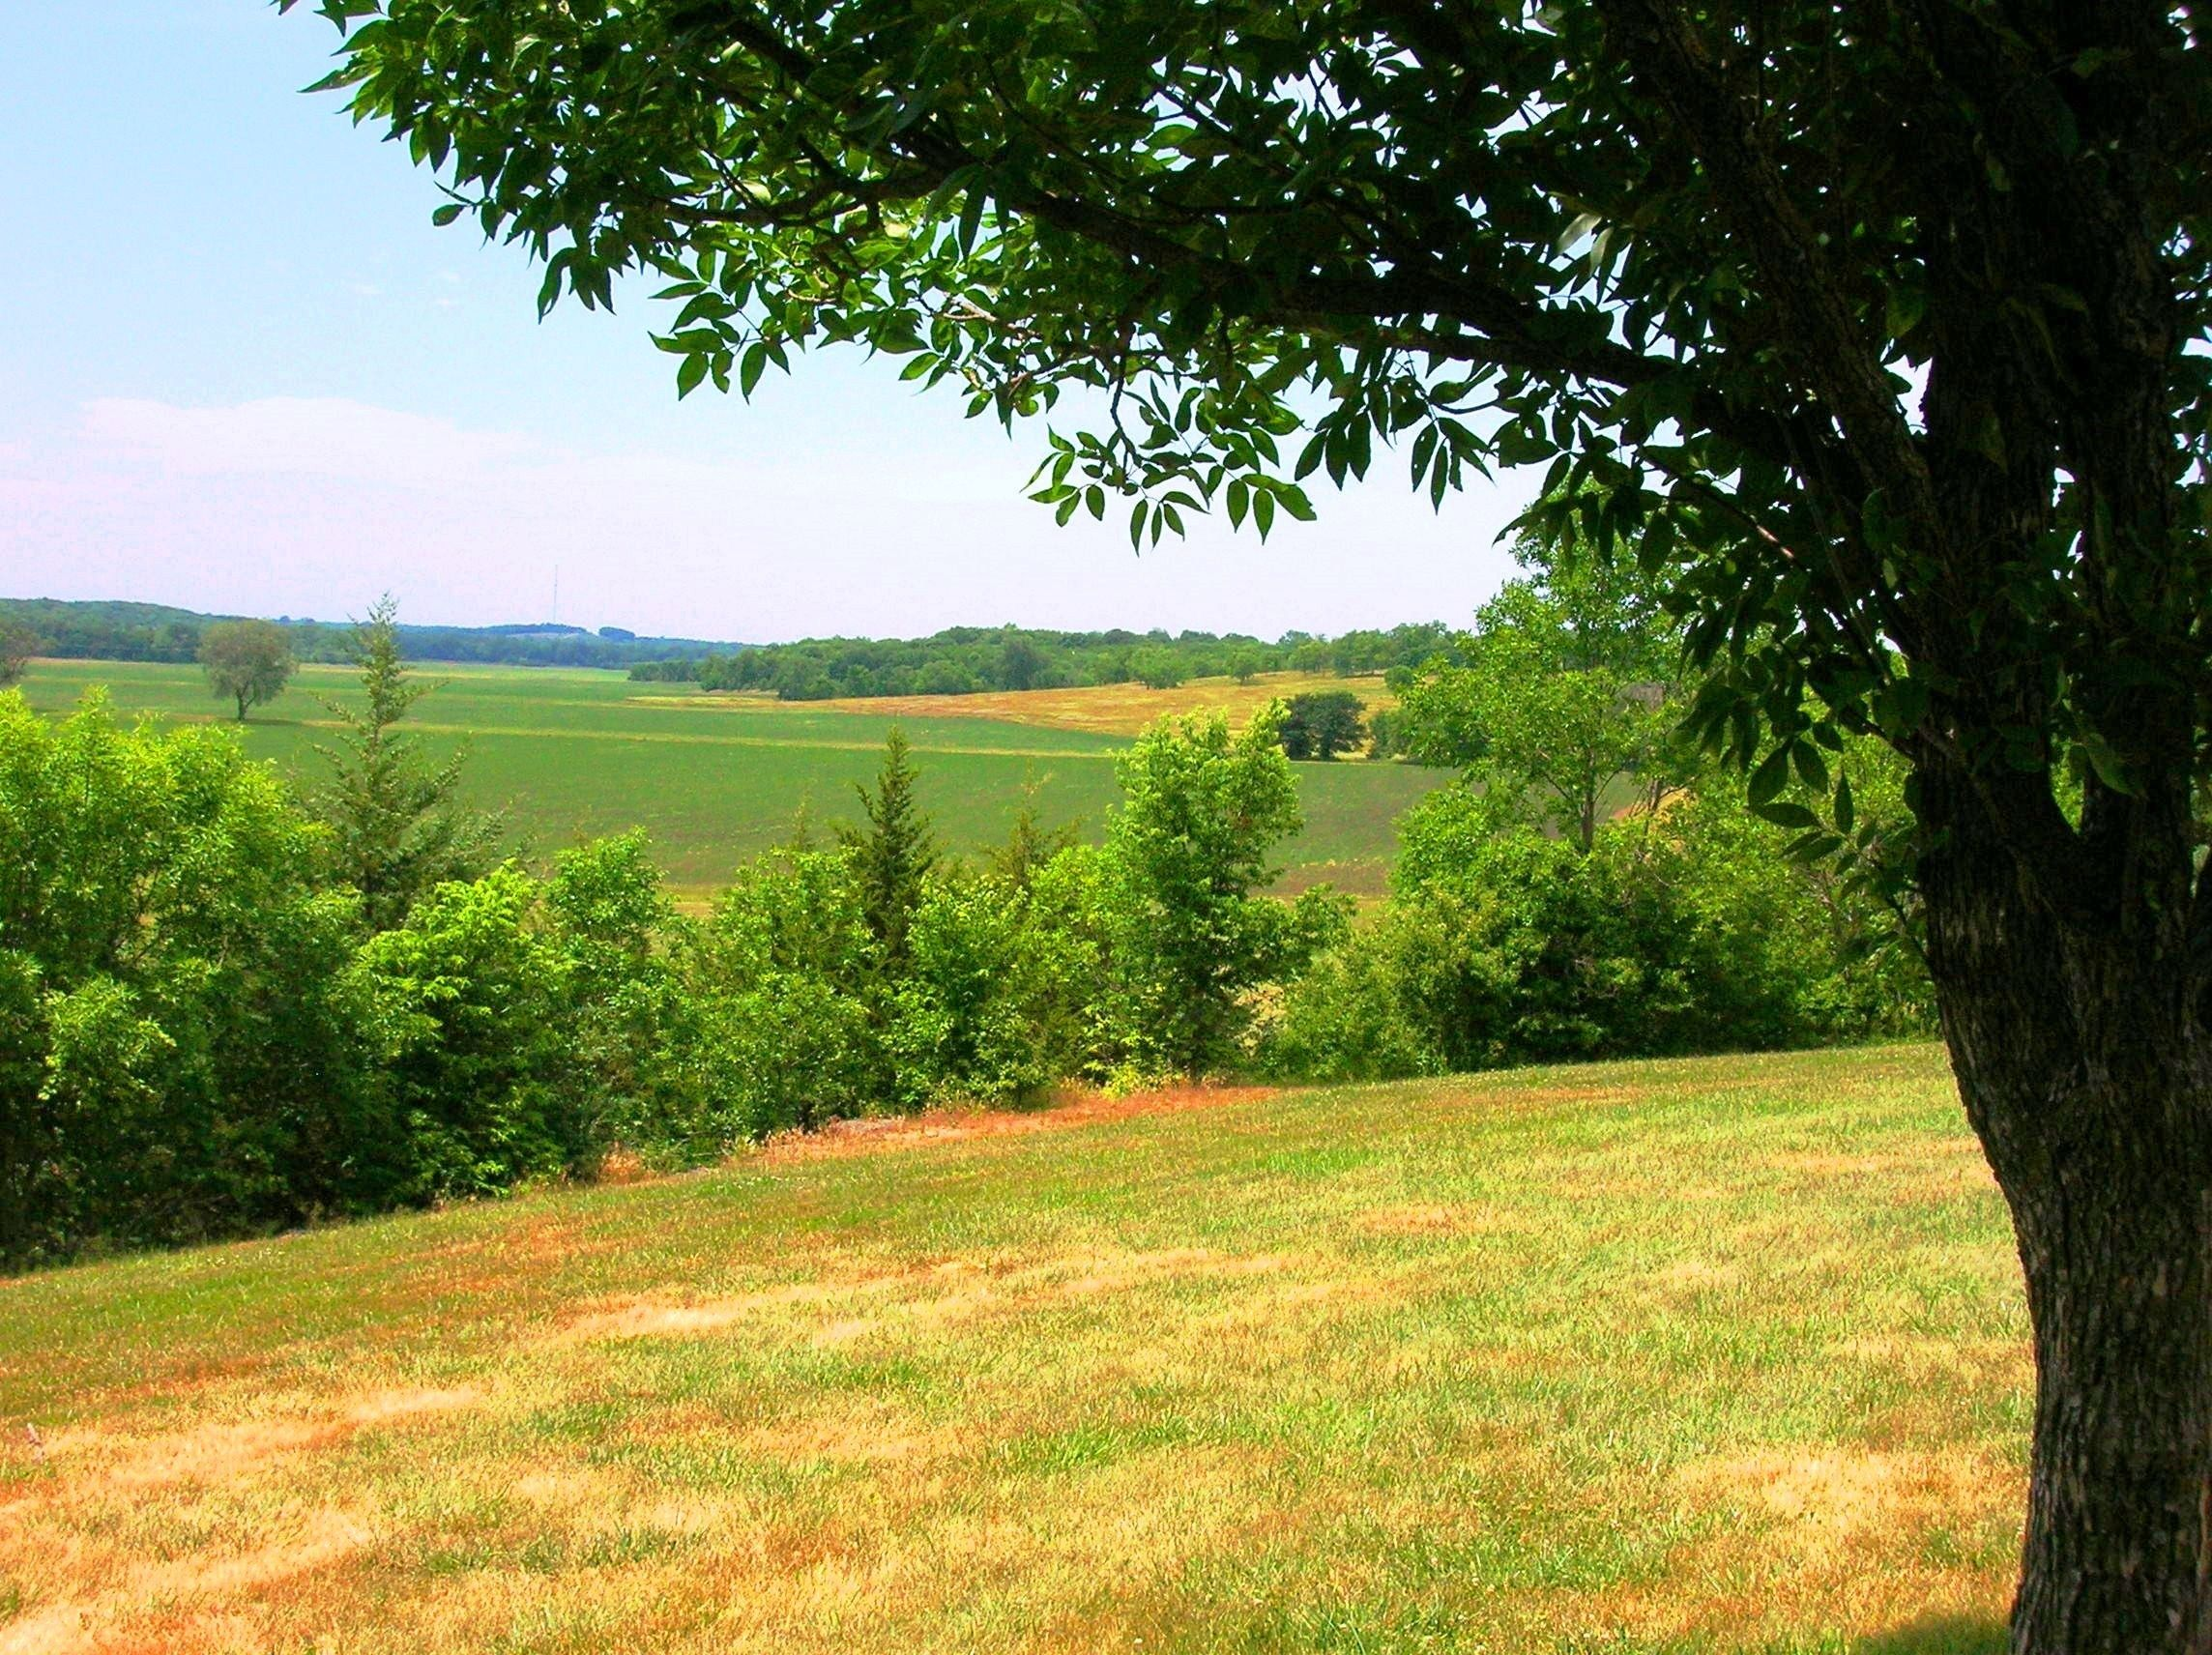 Looking out over Adam-ondi-Ahman in Missouri.